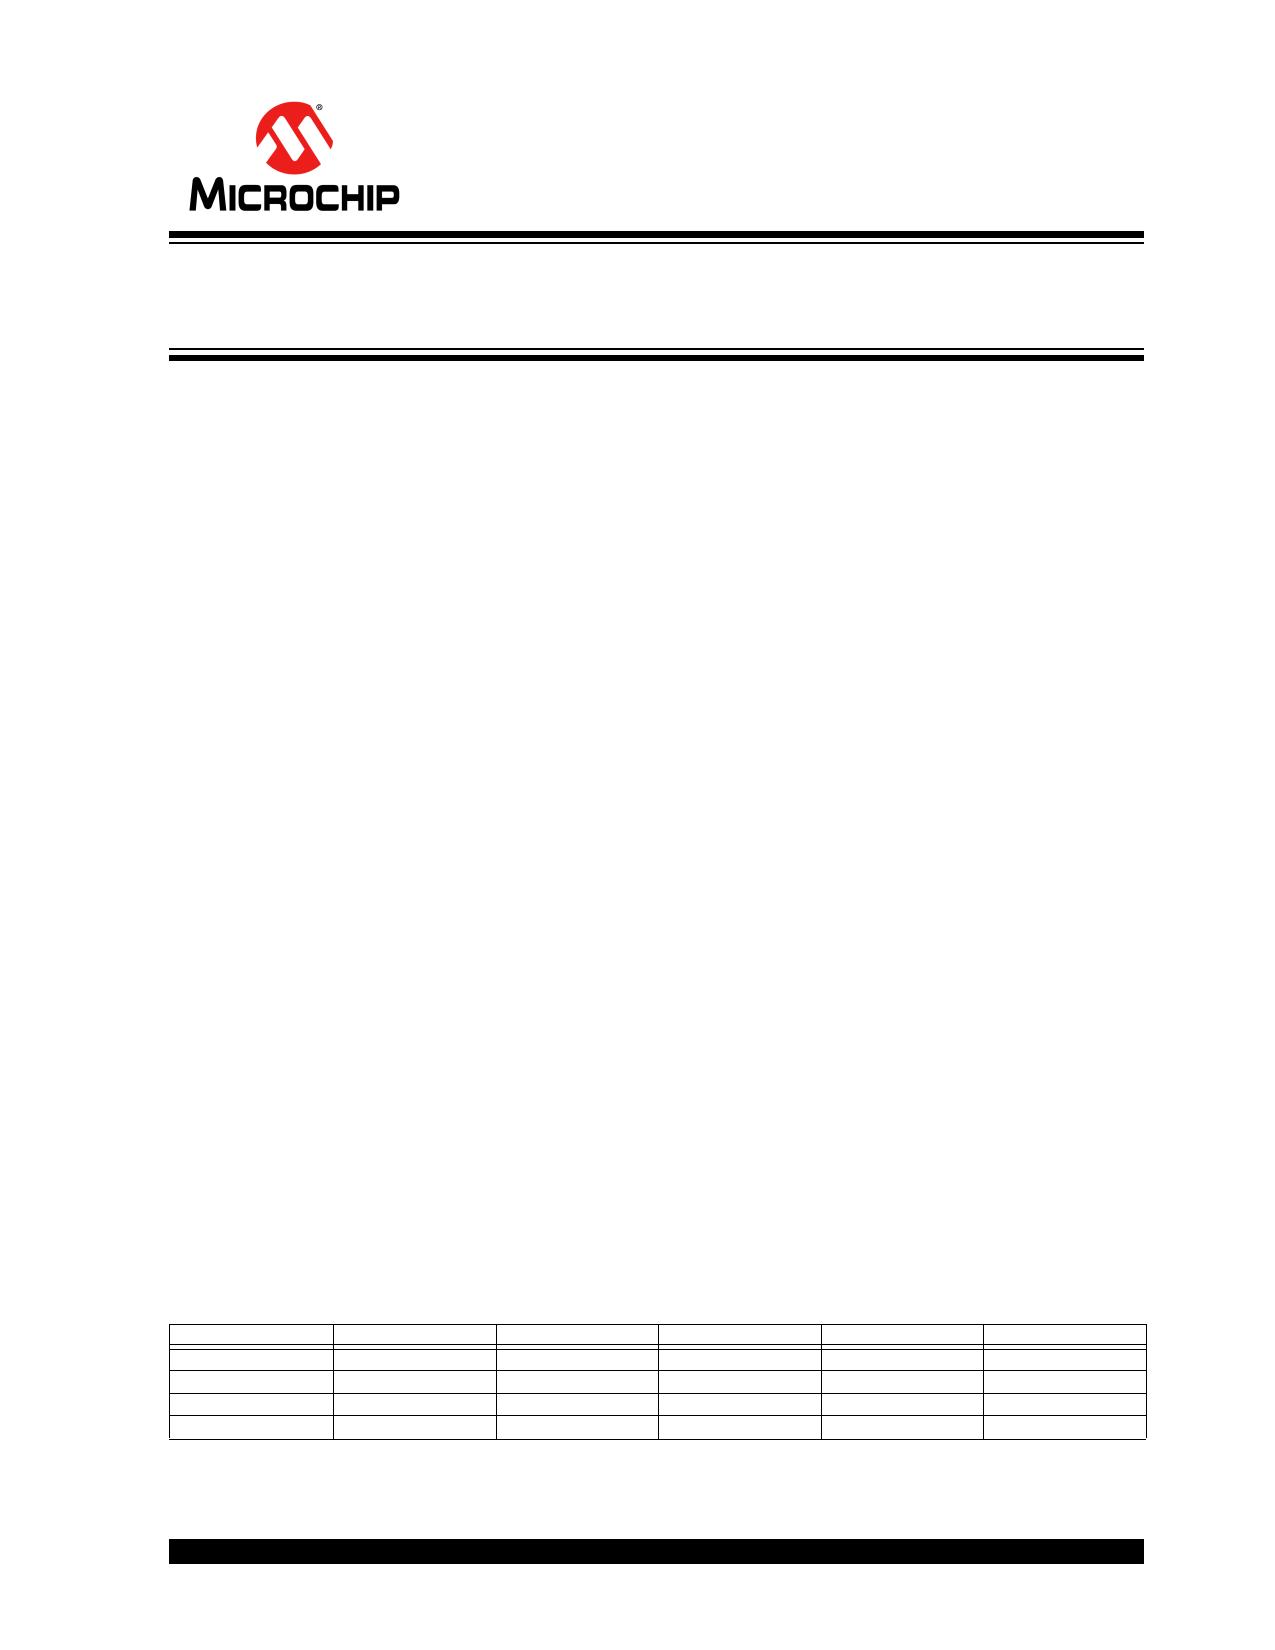 PIC24HJ64GP204 데이터시트 및 PIC24HJ64GP204 PDF